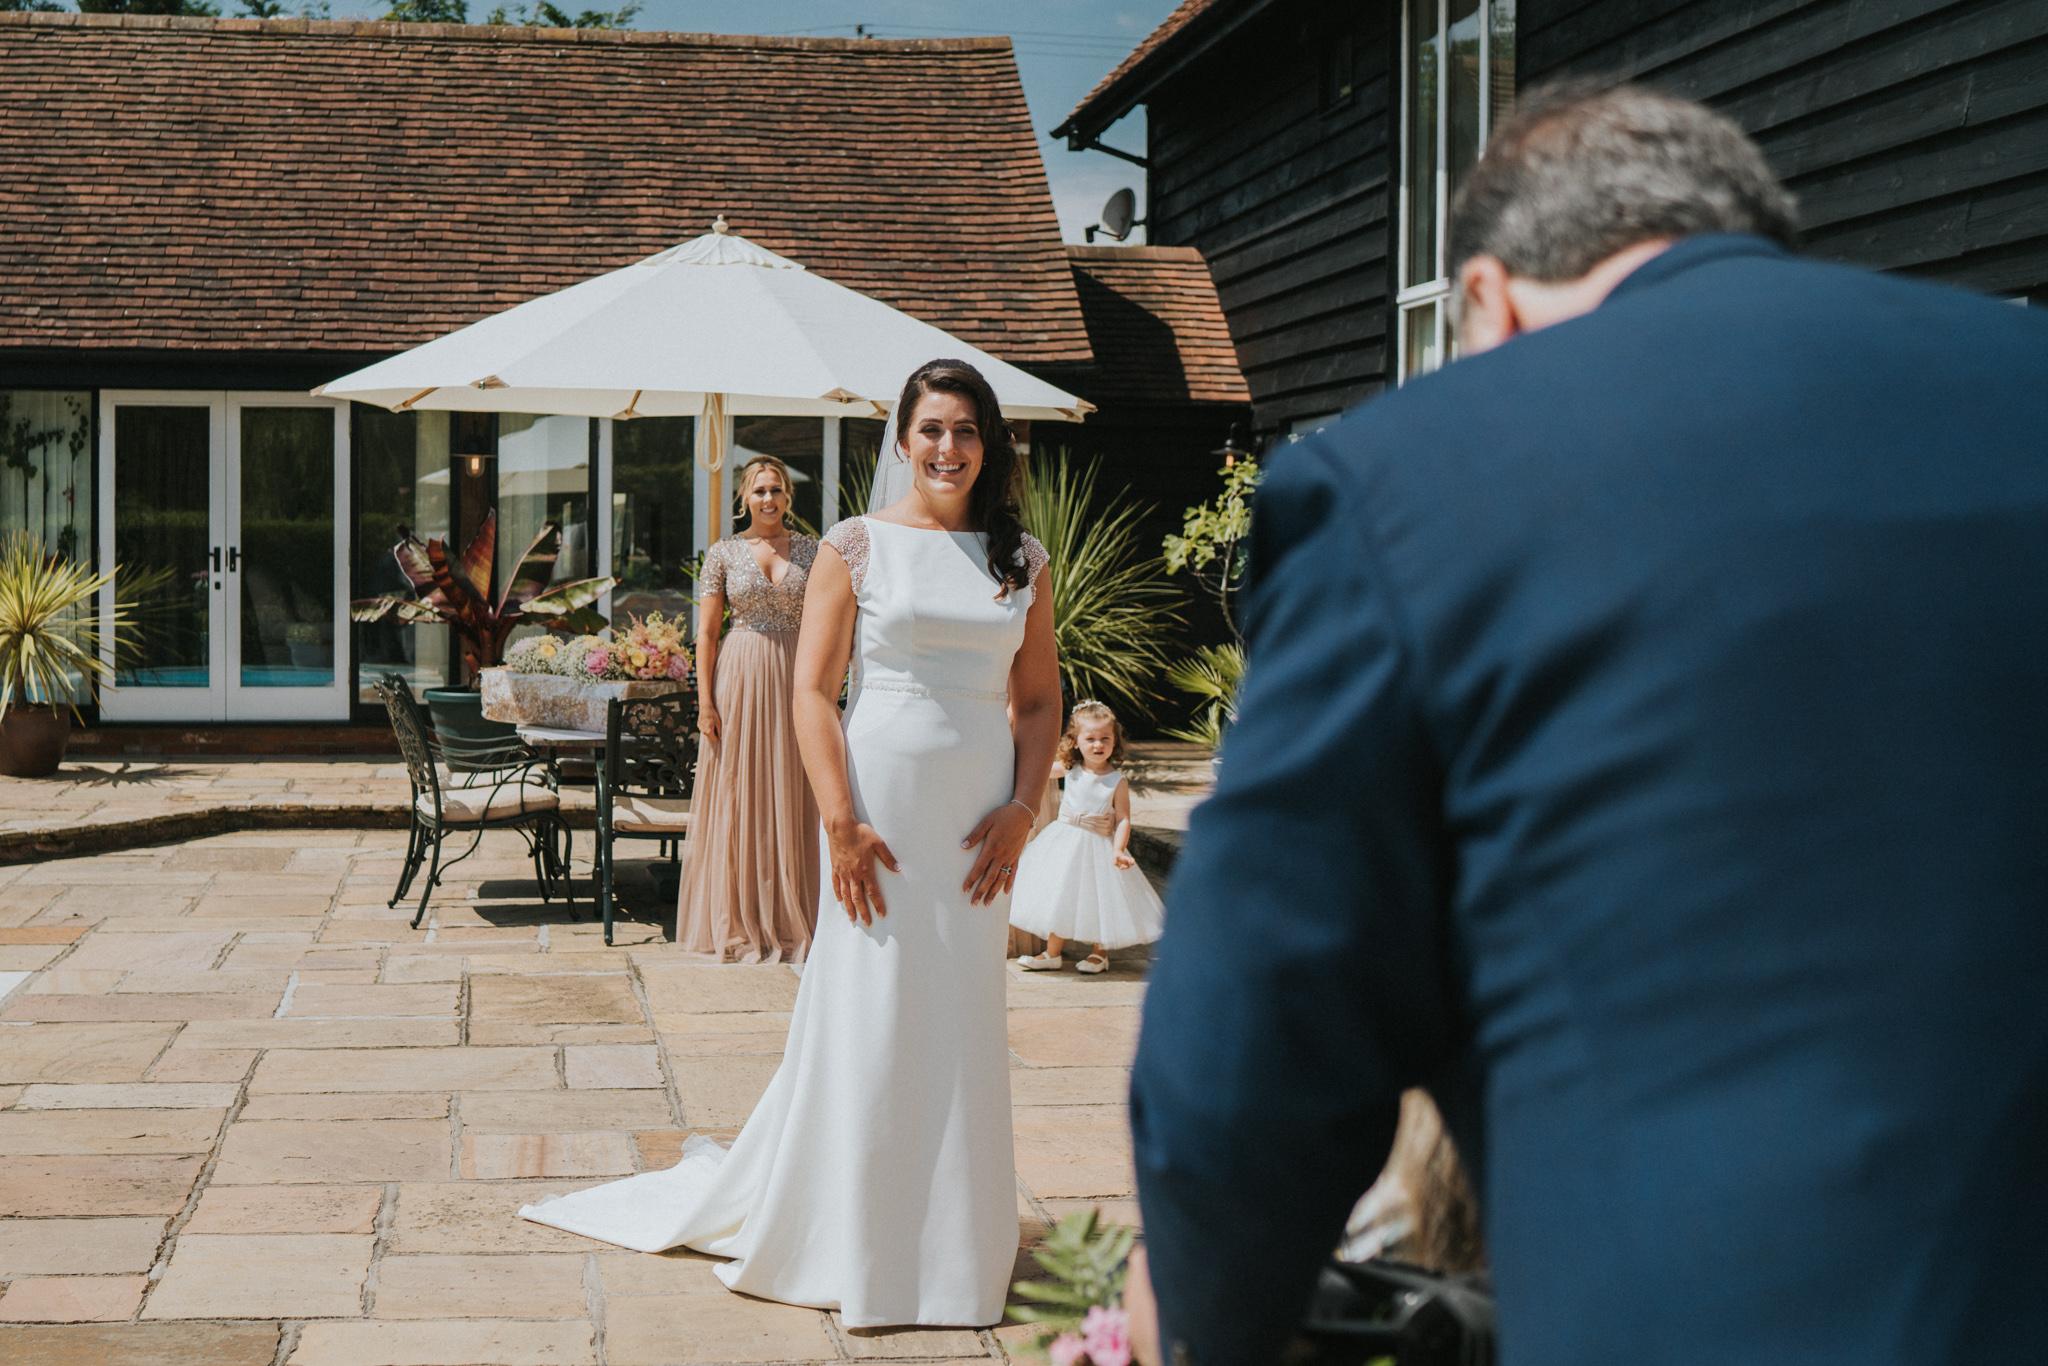 danielle-and-gareths-boho-wedding-previews-at-high-house-weddings-grace-elizabeth-colchester-essex-suffolk-norfolk-devon-alternative-wedding-and-lifestyle-photographer (20 of 76).jpg